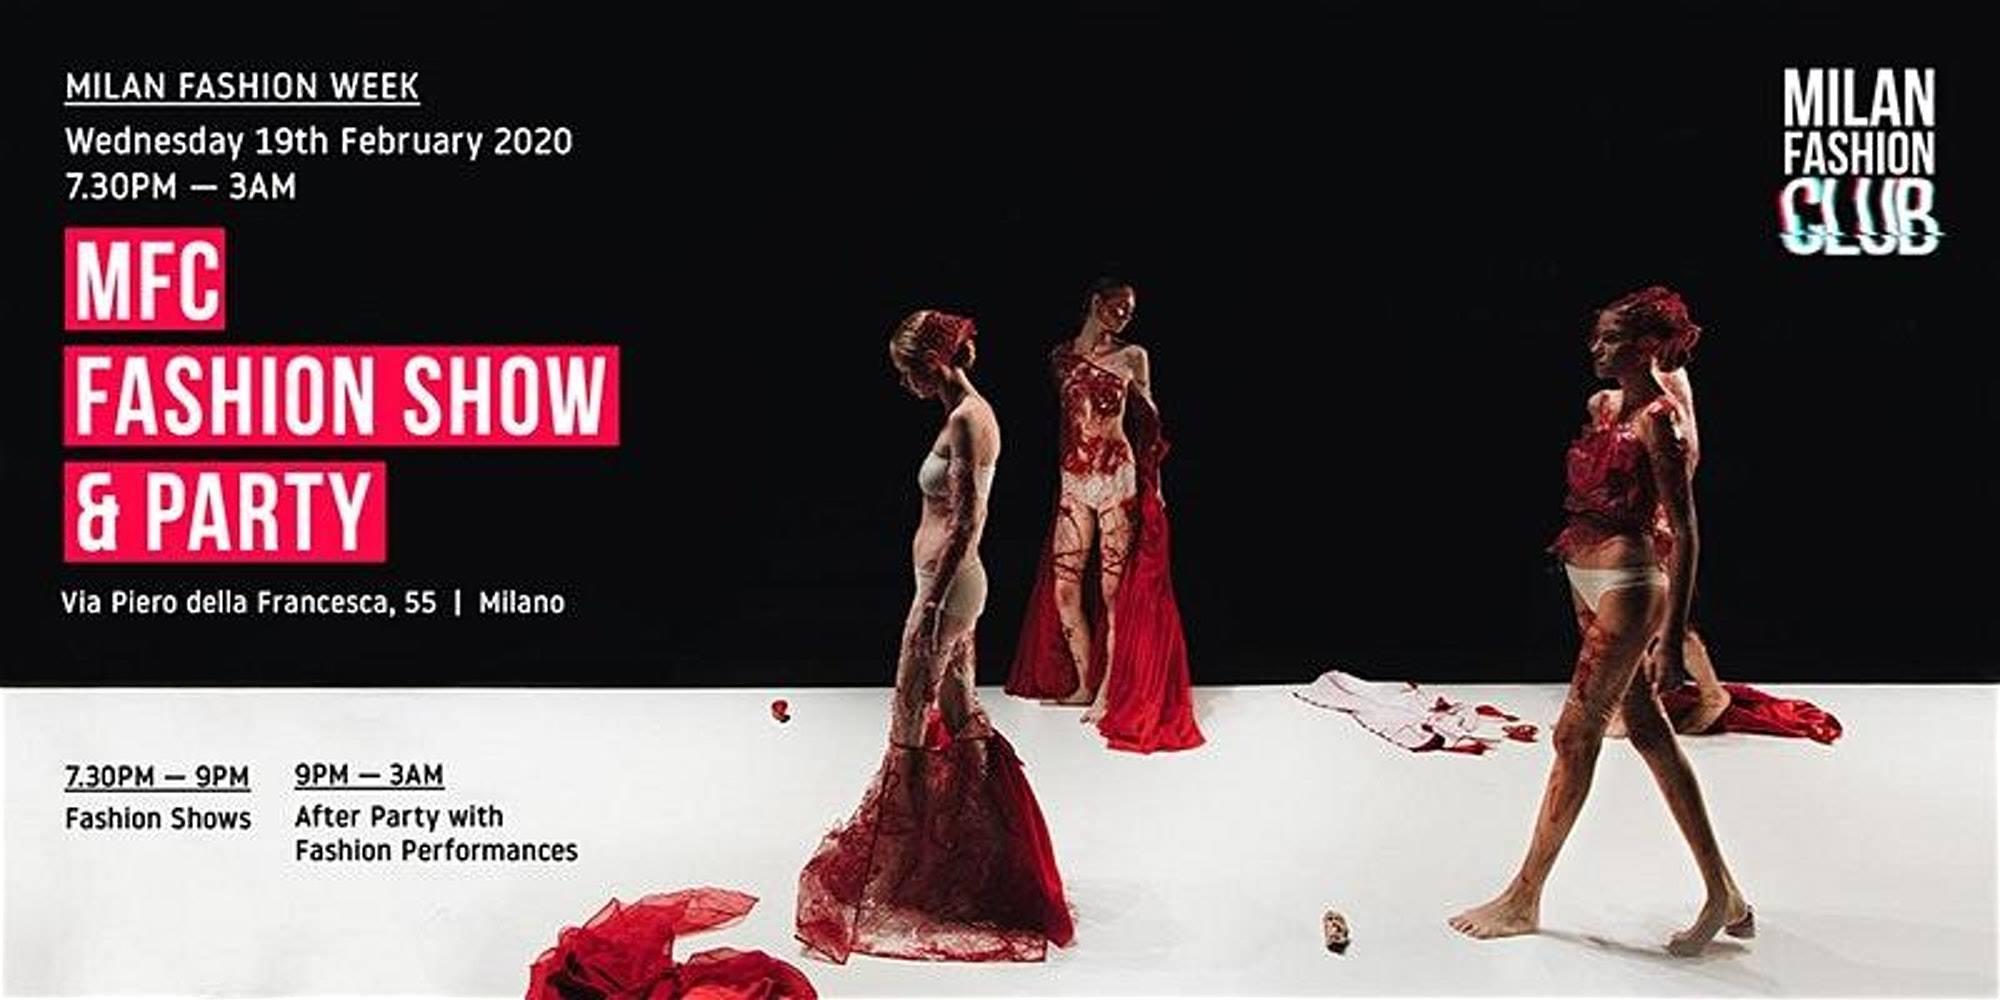 MFC FASHION SHOW PARTY | Milan Fashion Week